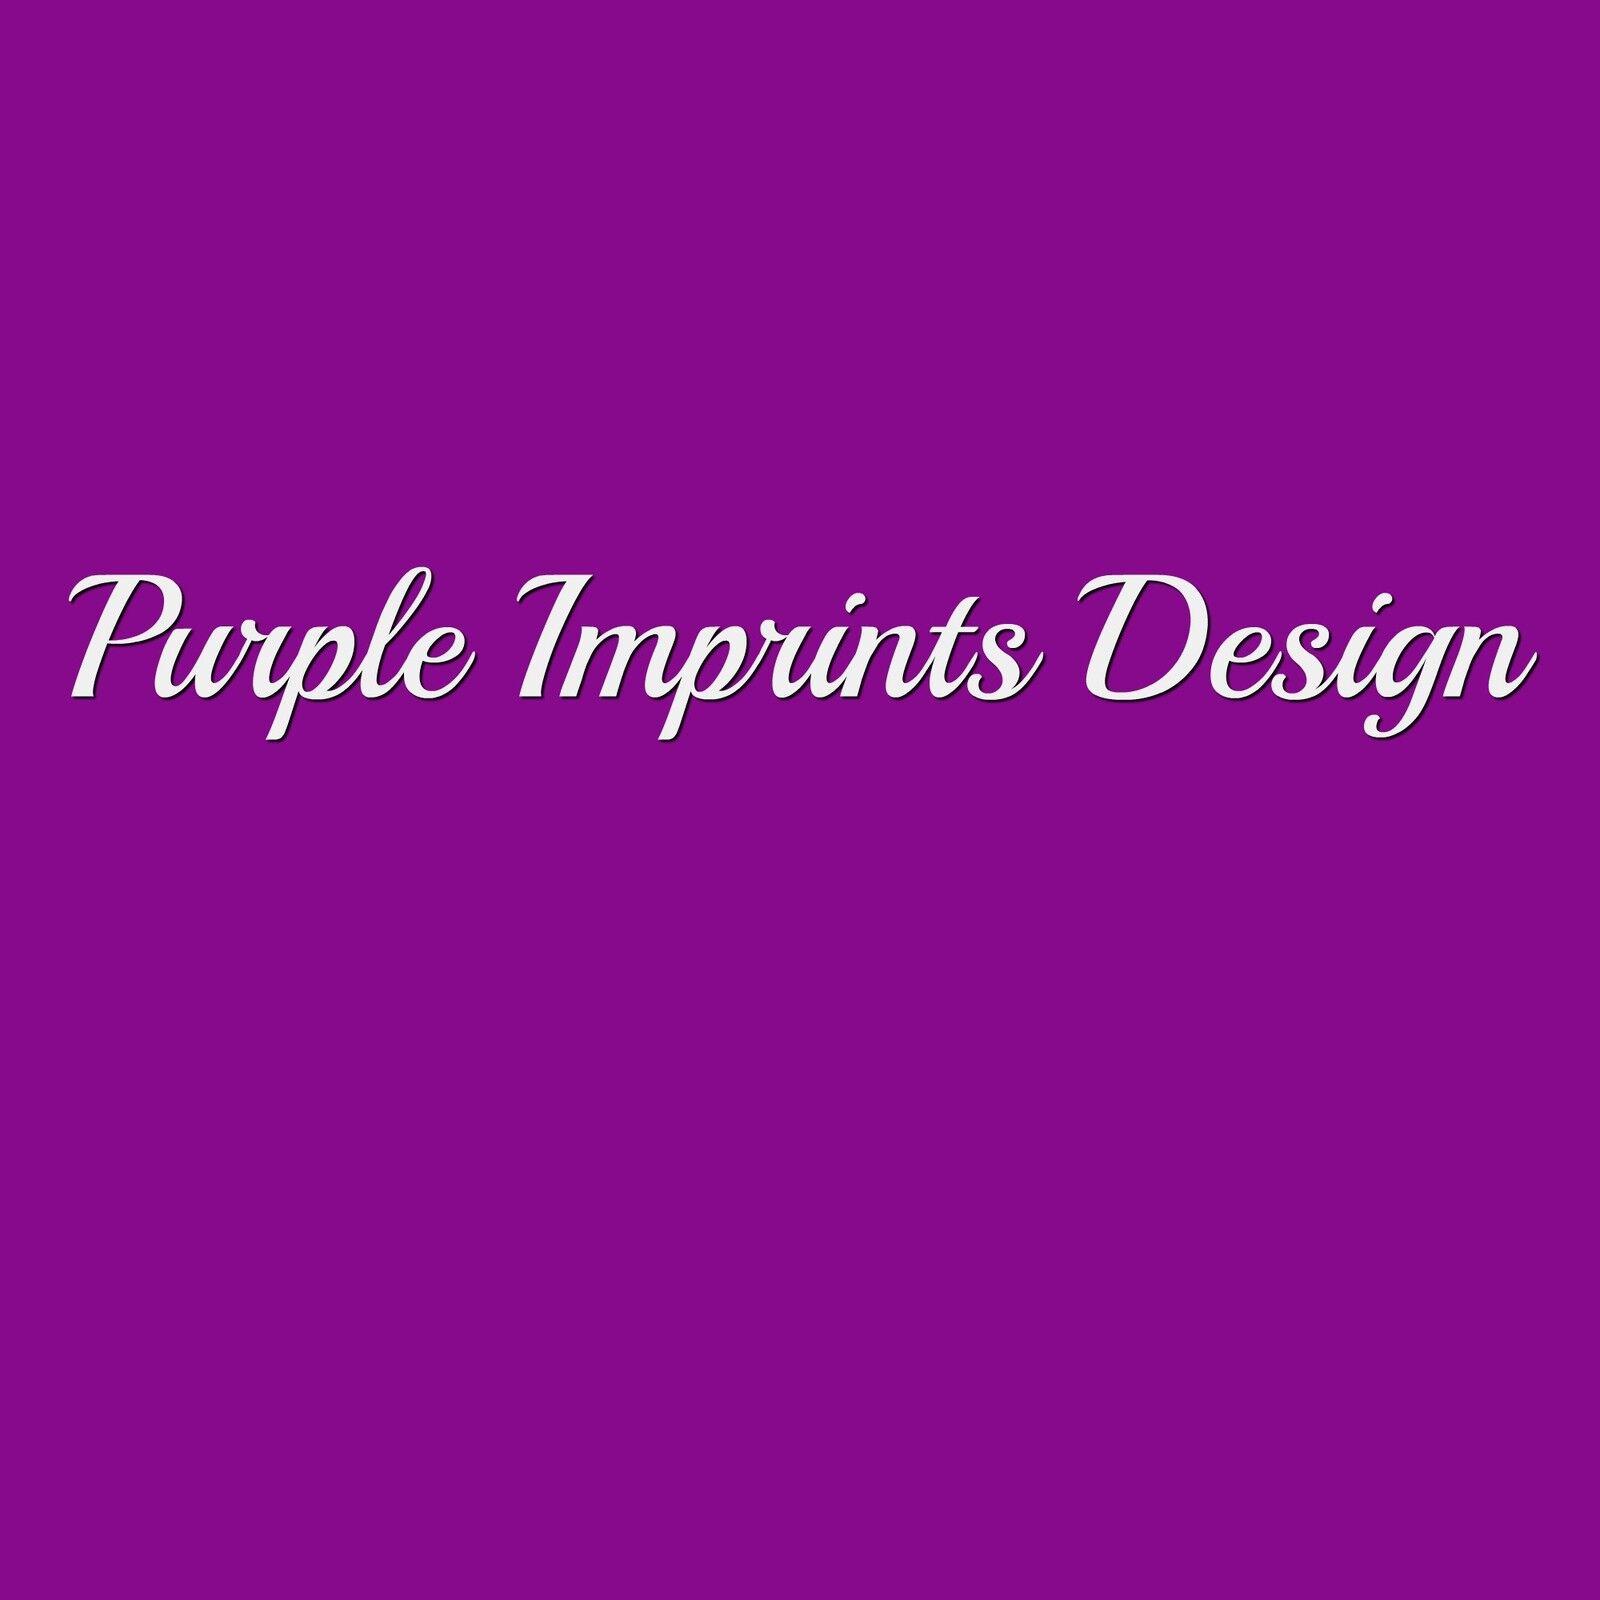 Purple Imprint Designs